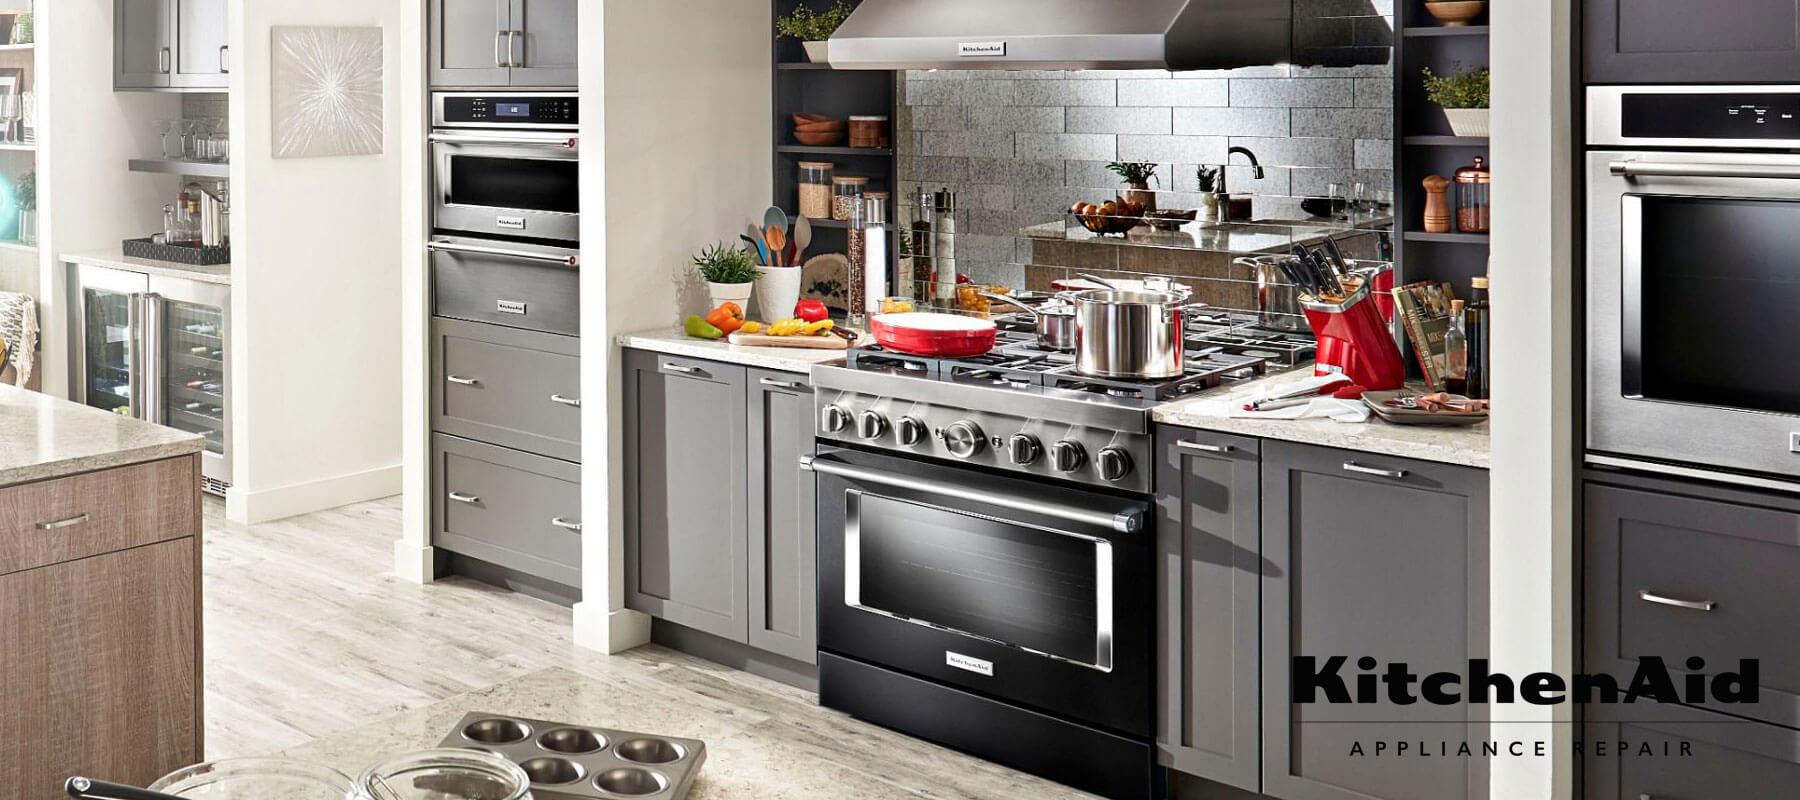 The Most In-Demand KitchenAid Appliance Repair Services | KitchenAid Appliance Repair Professionals